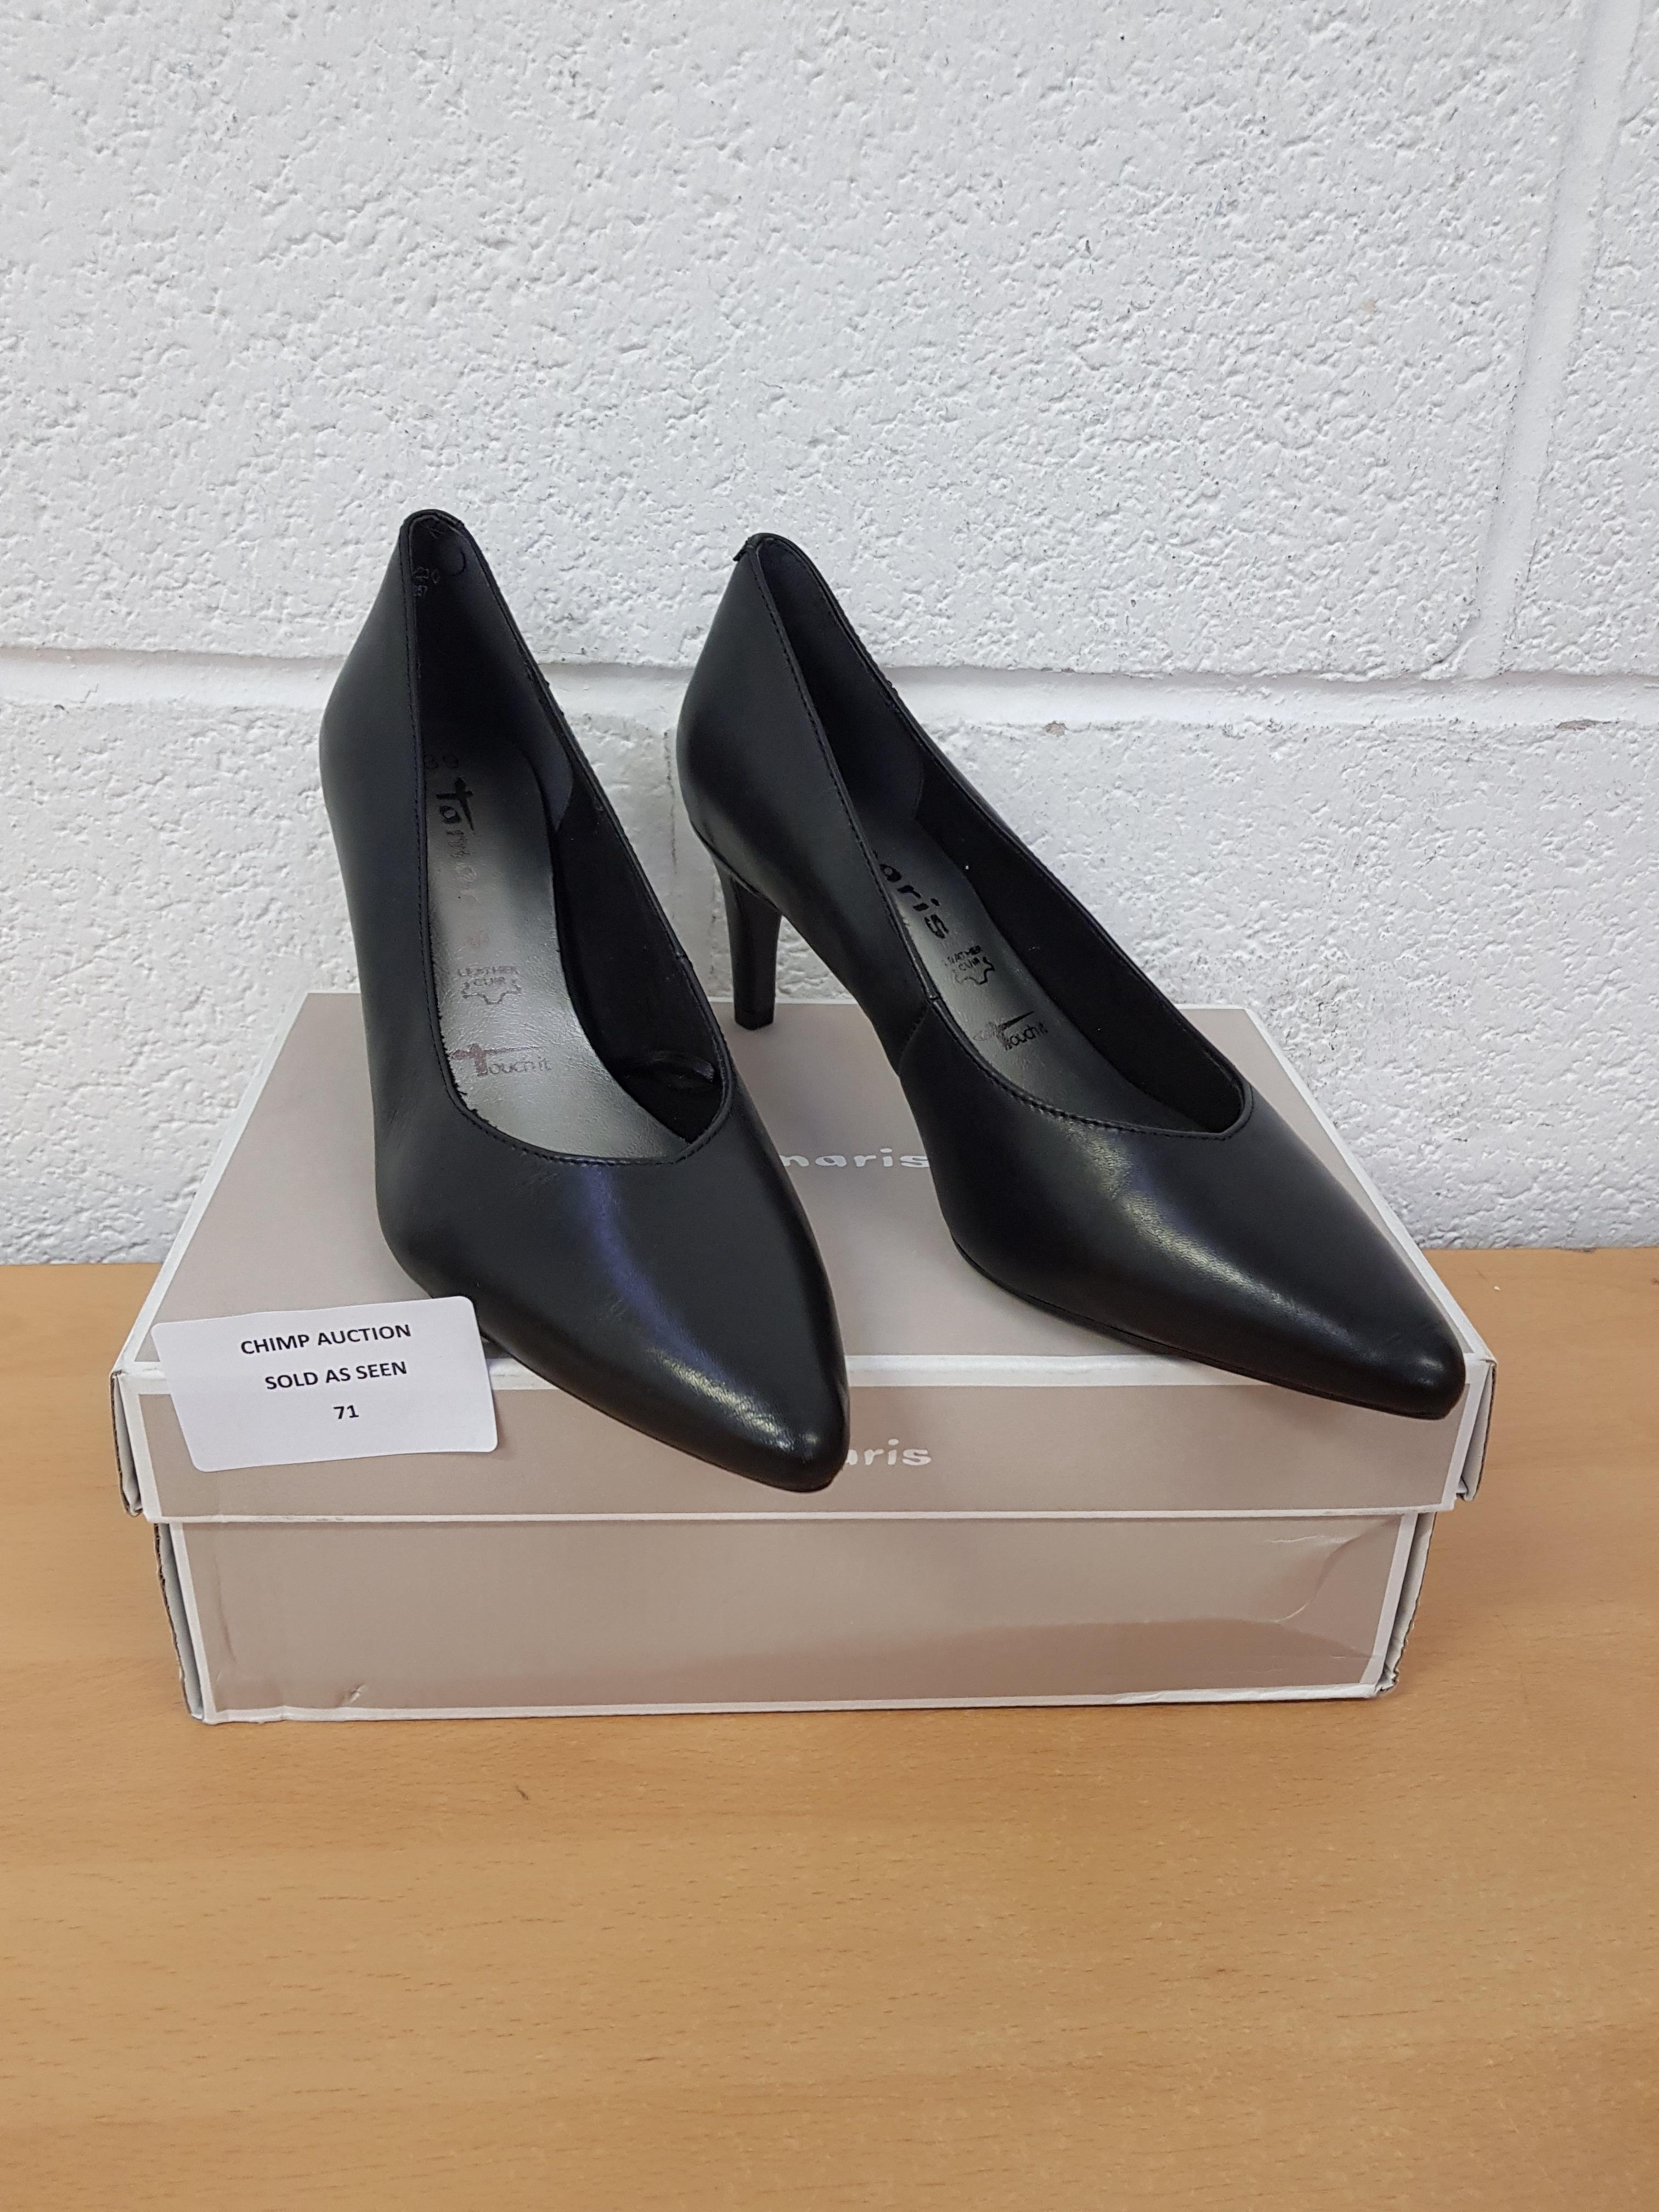 Lot 71 - Tamaris ladies shoes EU 39